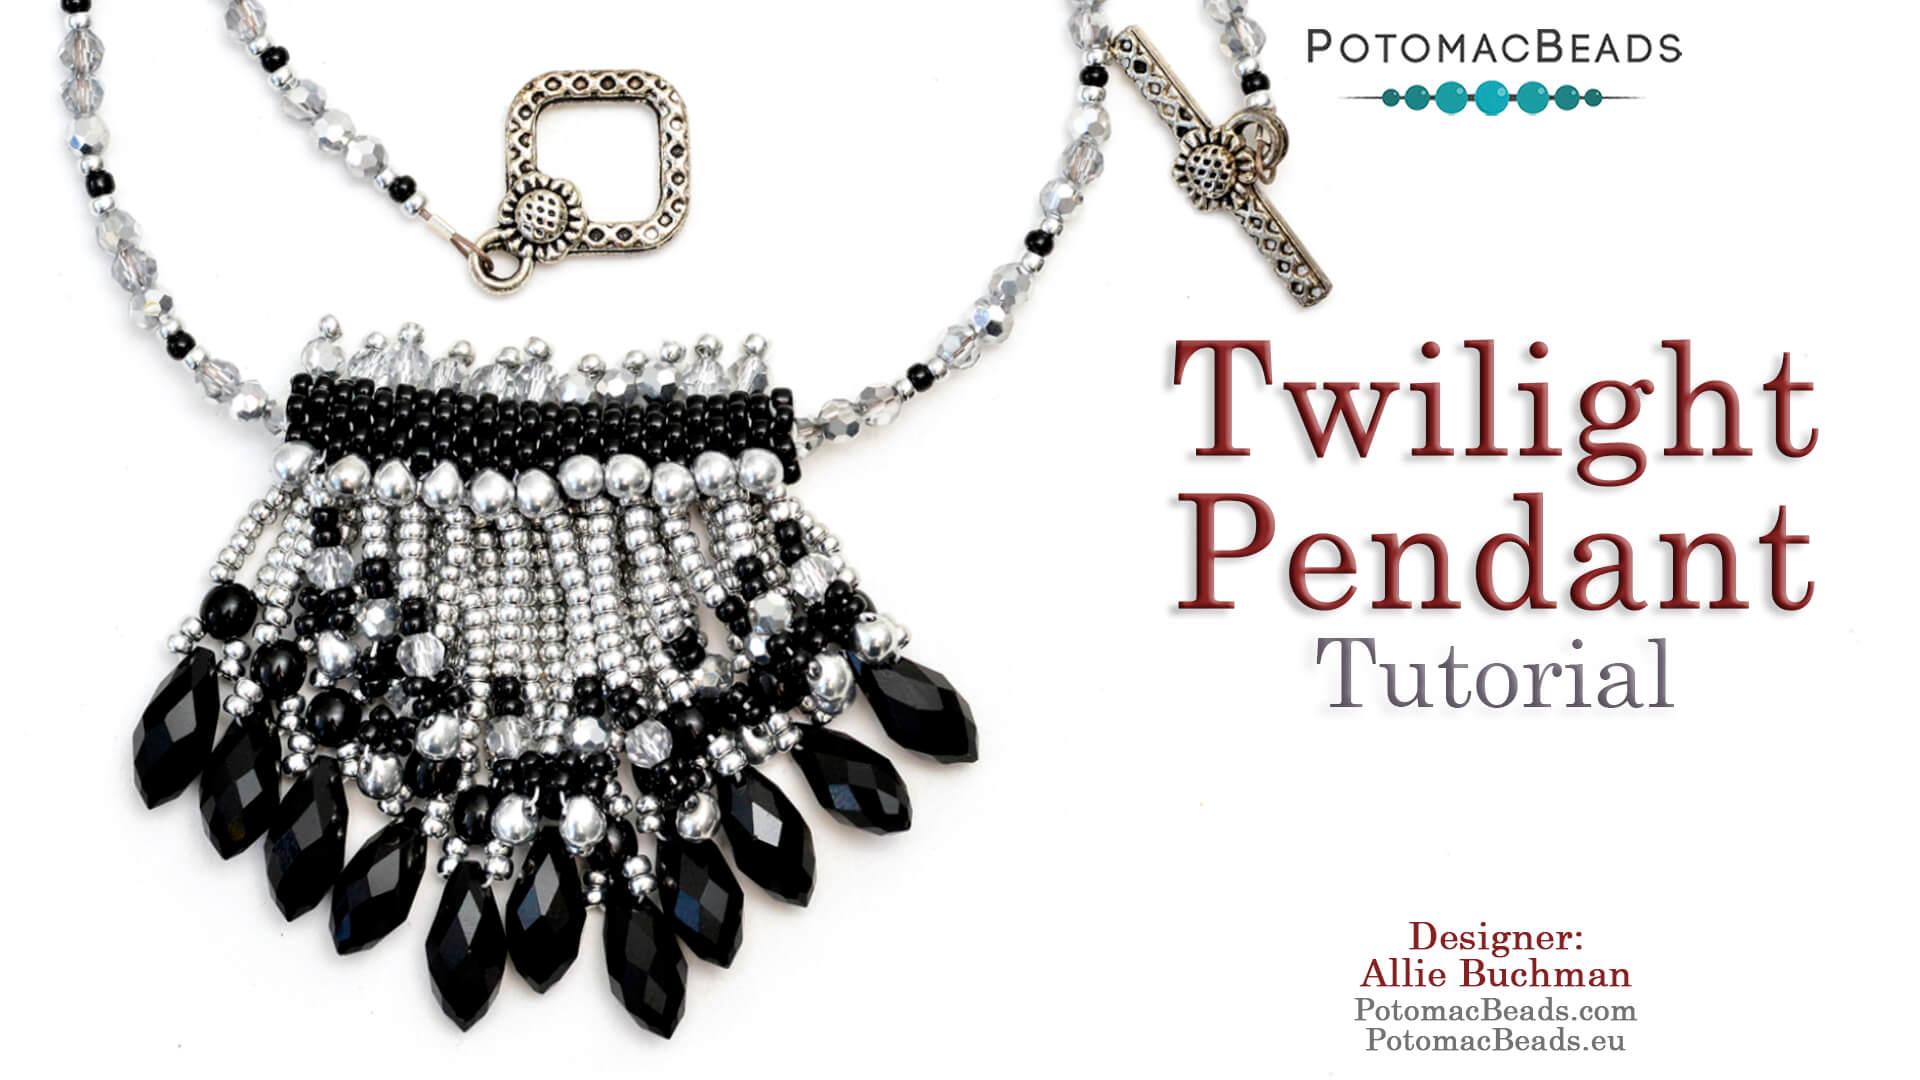 How to Bead / Videos Sorted by Beads / RounDuo® & RounDuo® Mini Bead Videos / Twilight Pendant Tutorial